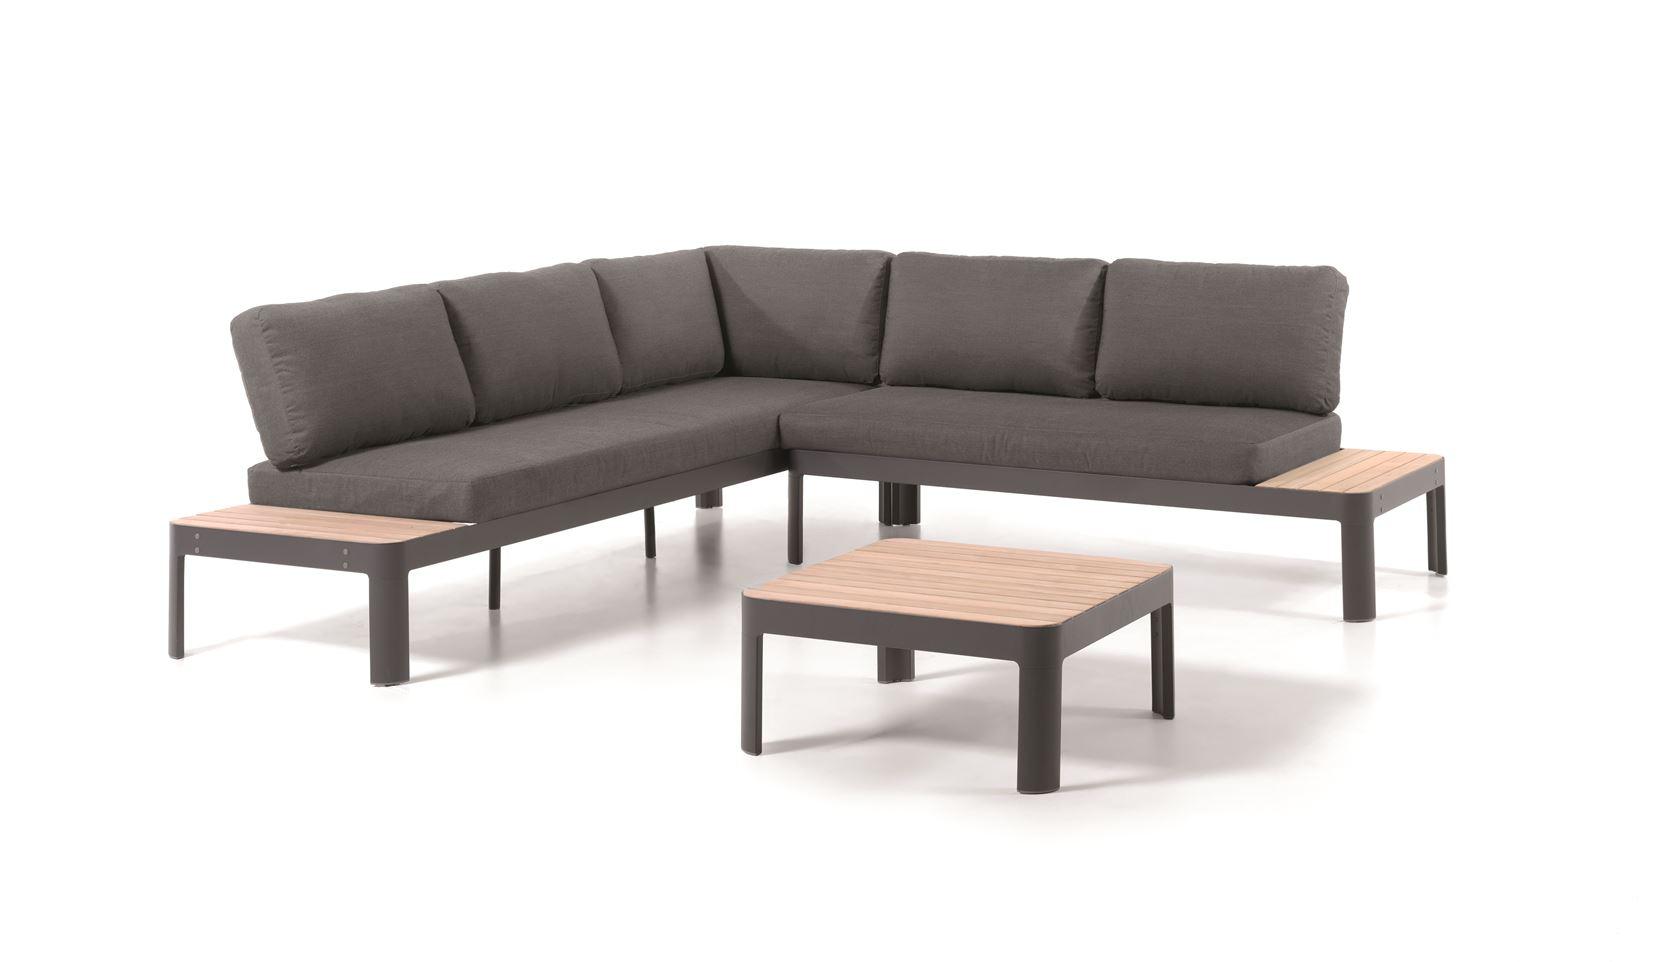 gescova oslo lounge set alu teak cushions grey